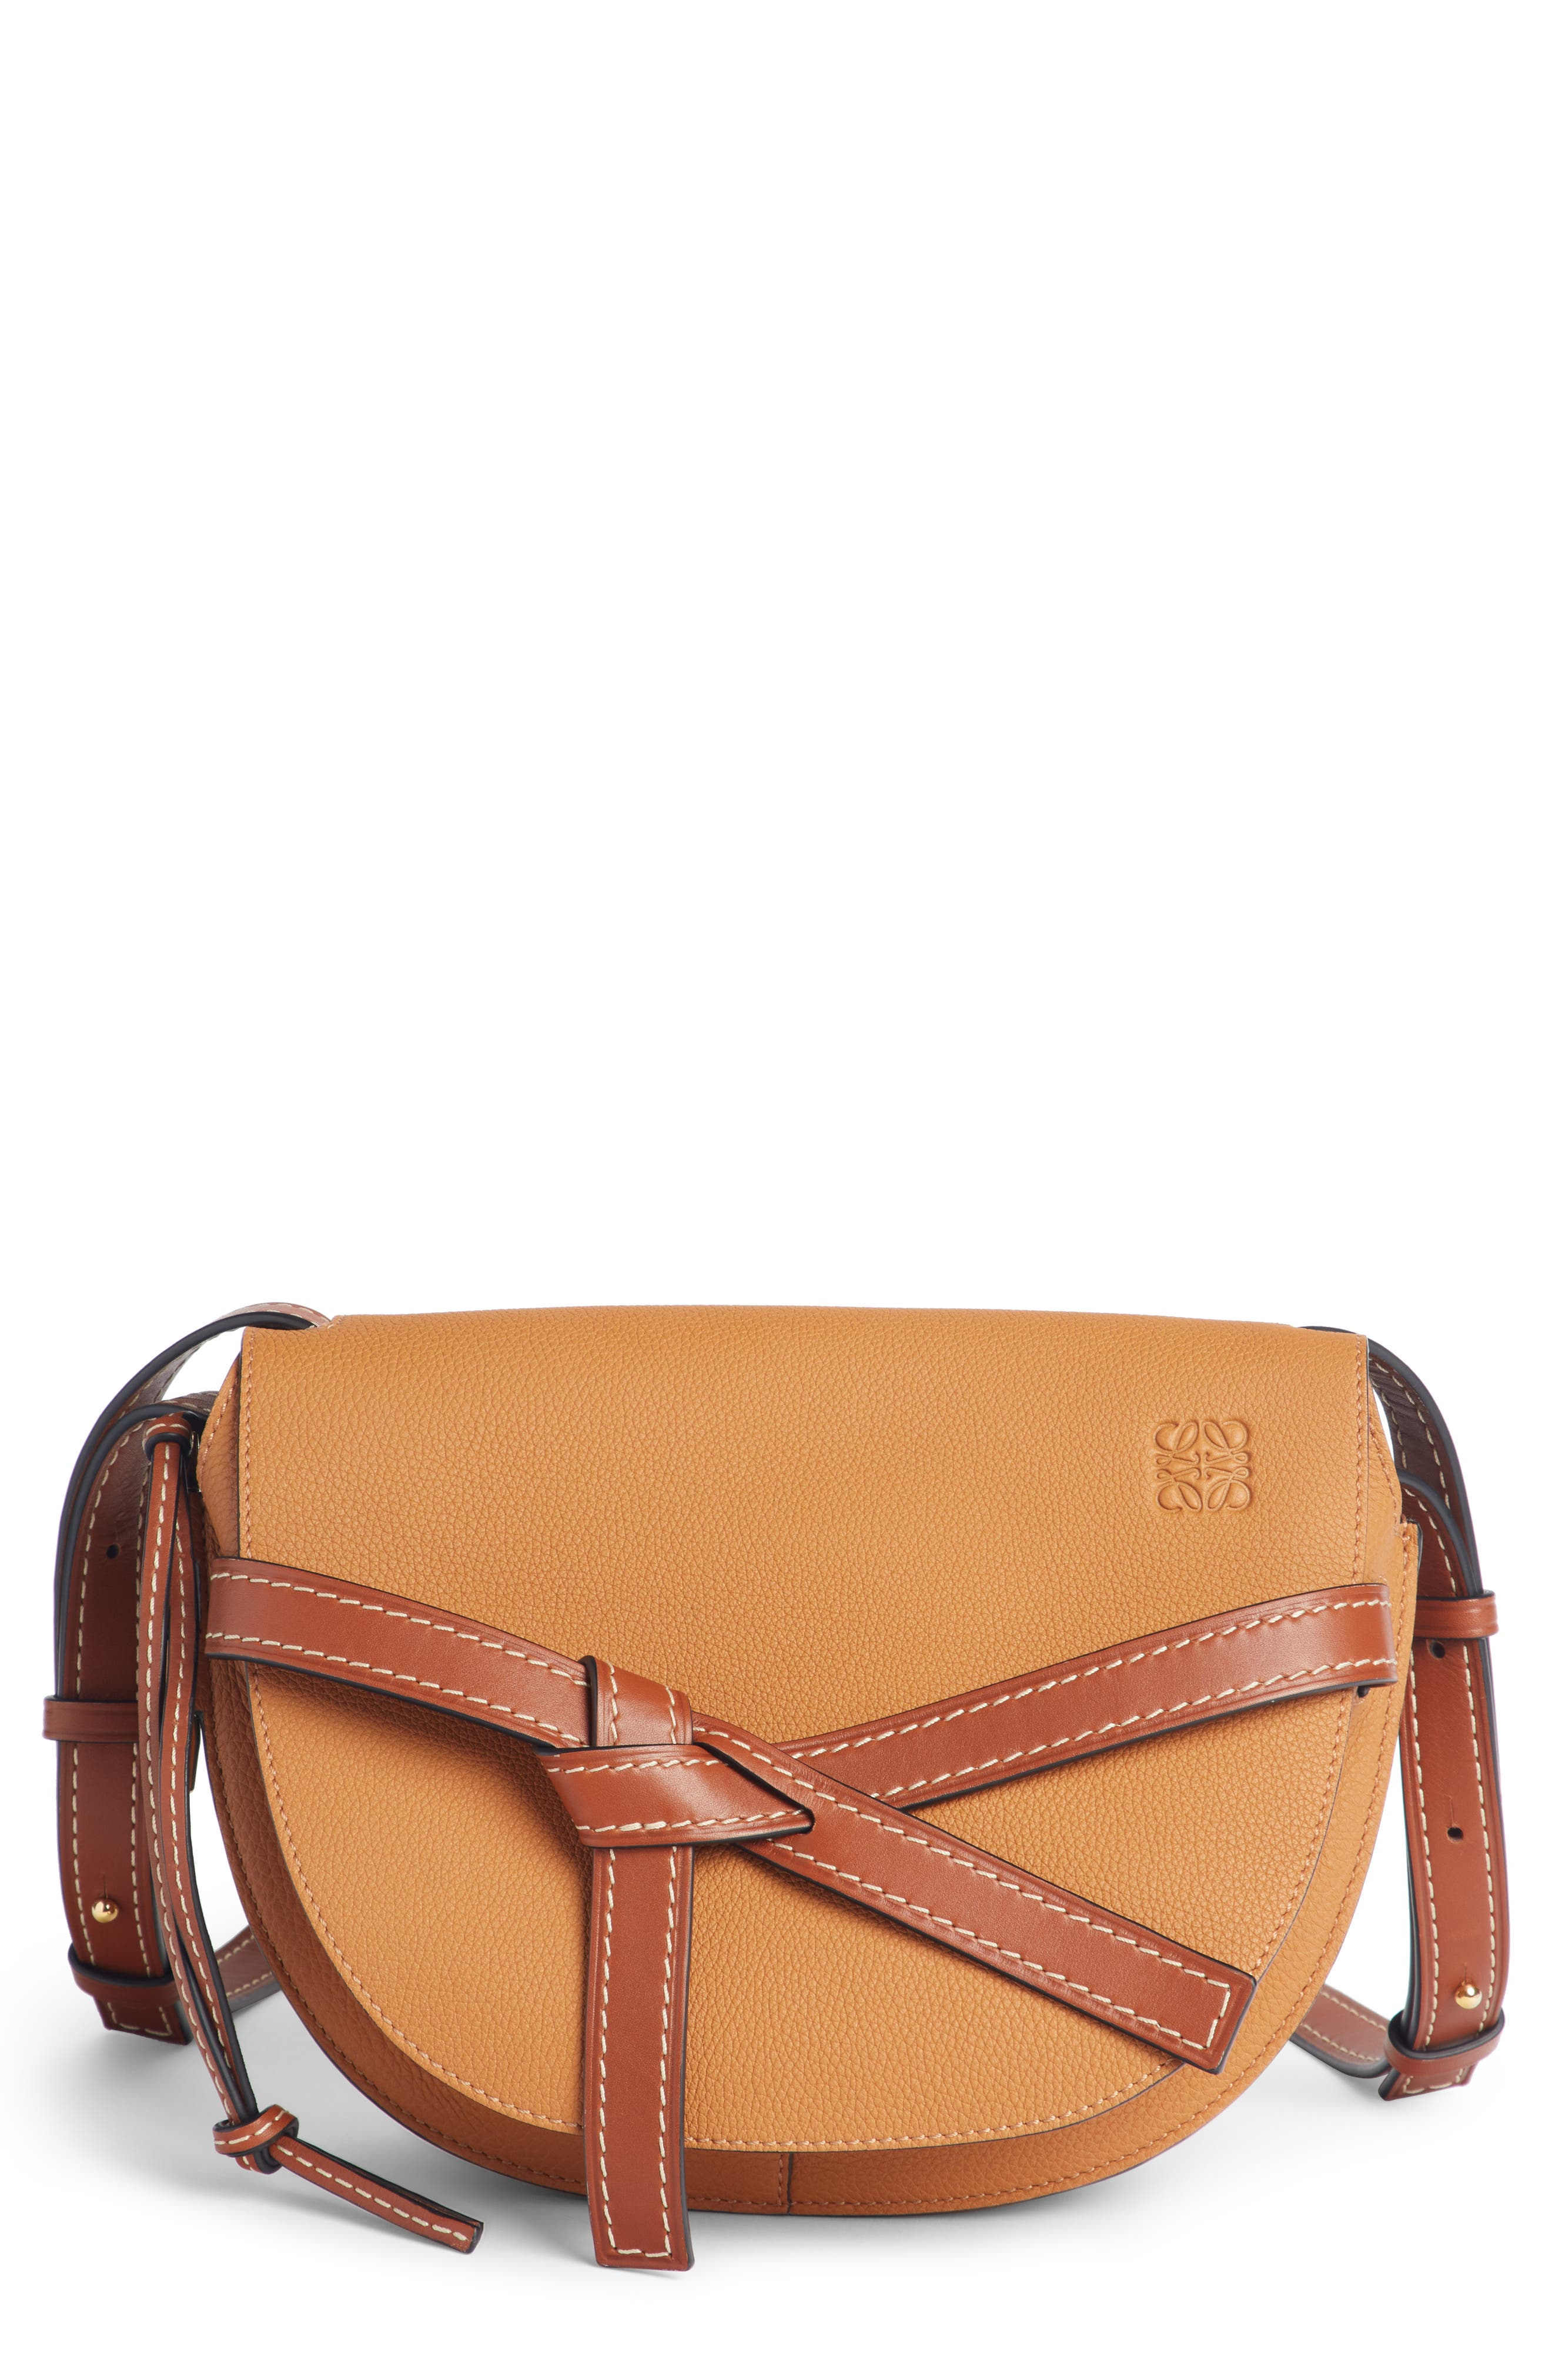 LOEWE Small Gate Leather Crossbody Bag, Main, color, LIGHT CARAMEL/ PECAN